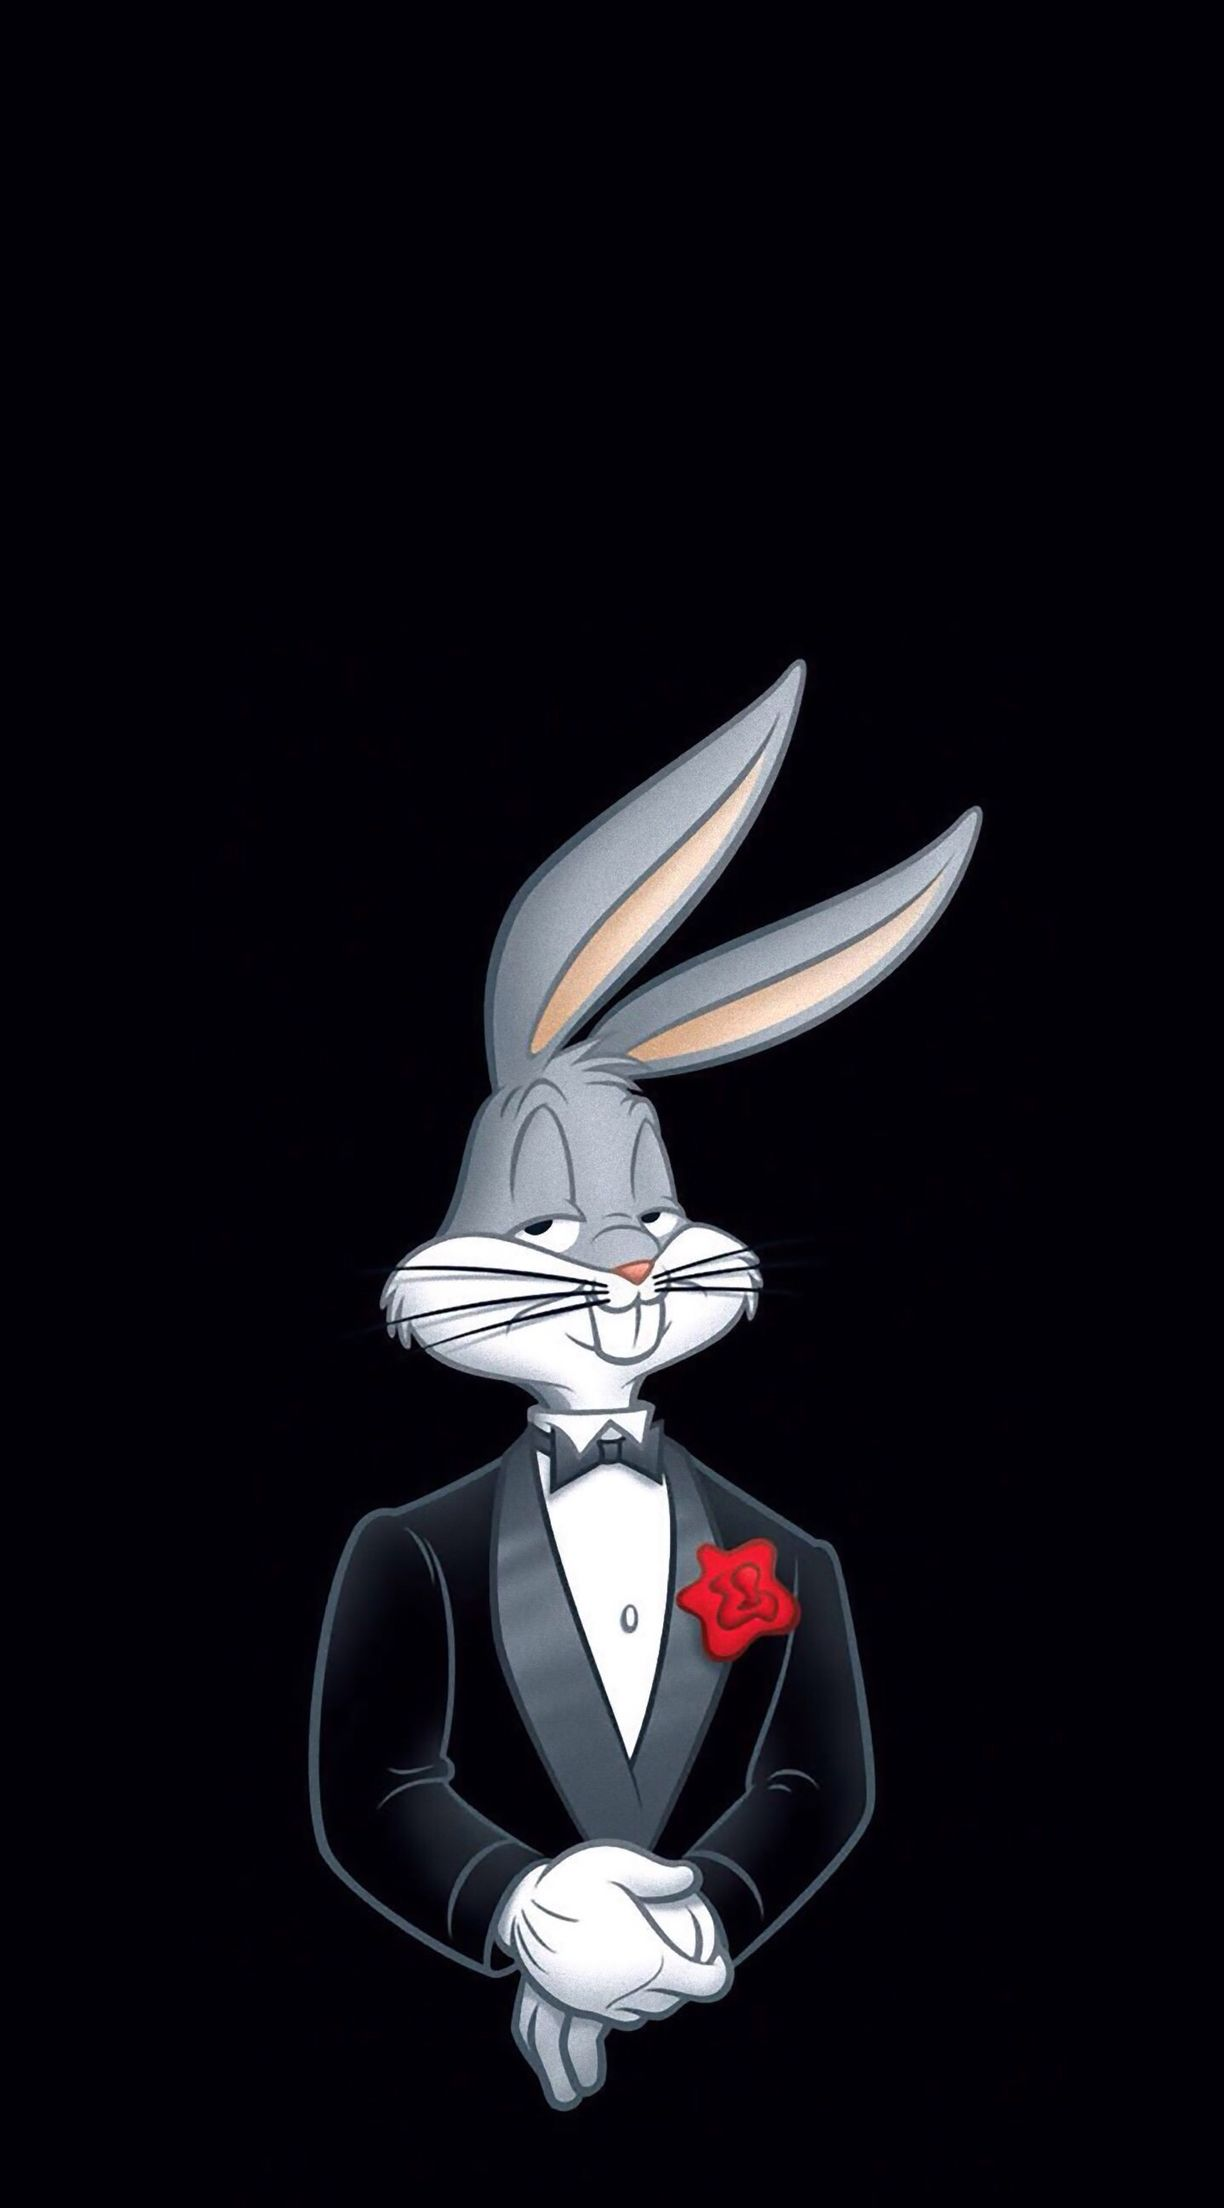 Bugs Bunny Wearing A Tuxedo Art Bunny Wallpaper Looney Tunes